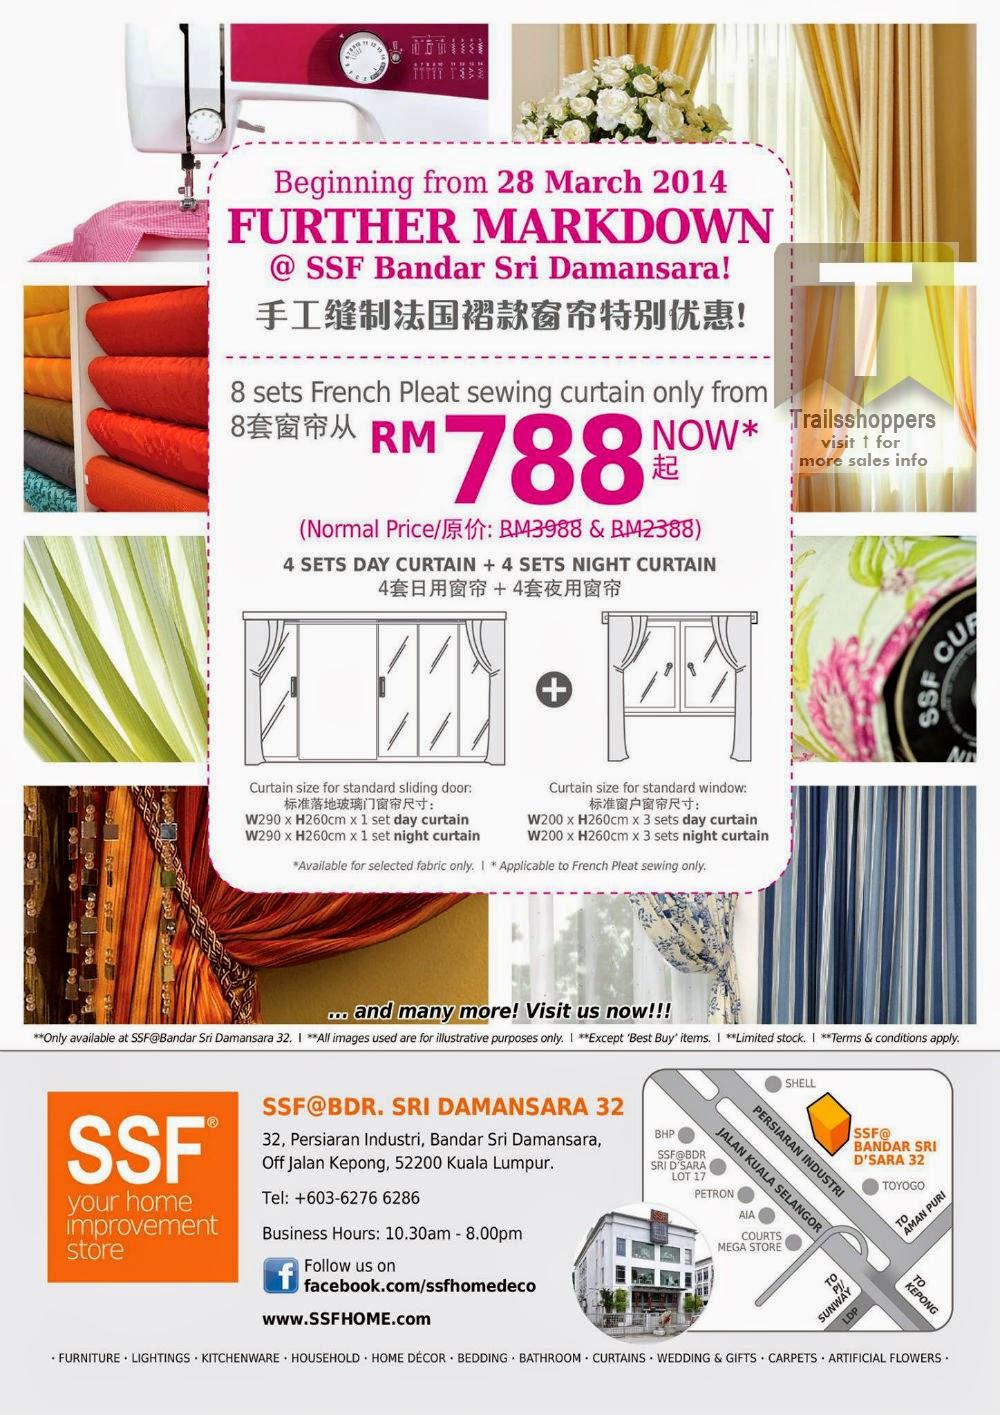 SSF Outlets Bandar Sri Damansar Clearance Sale